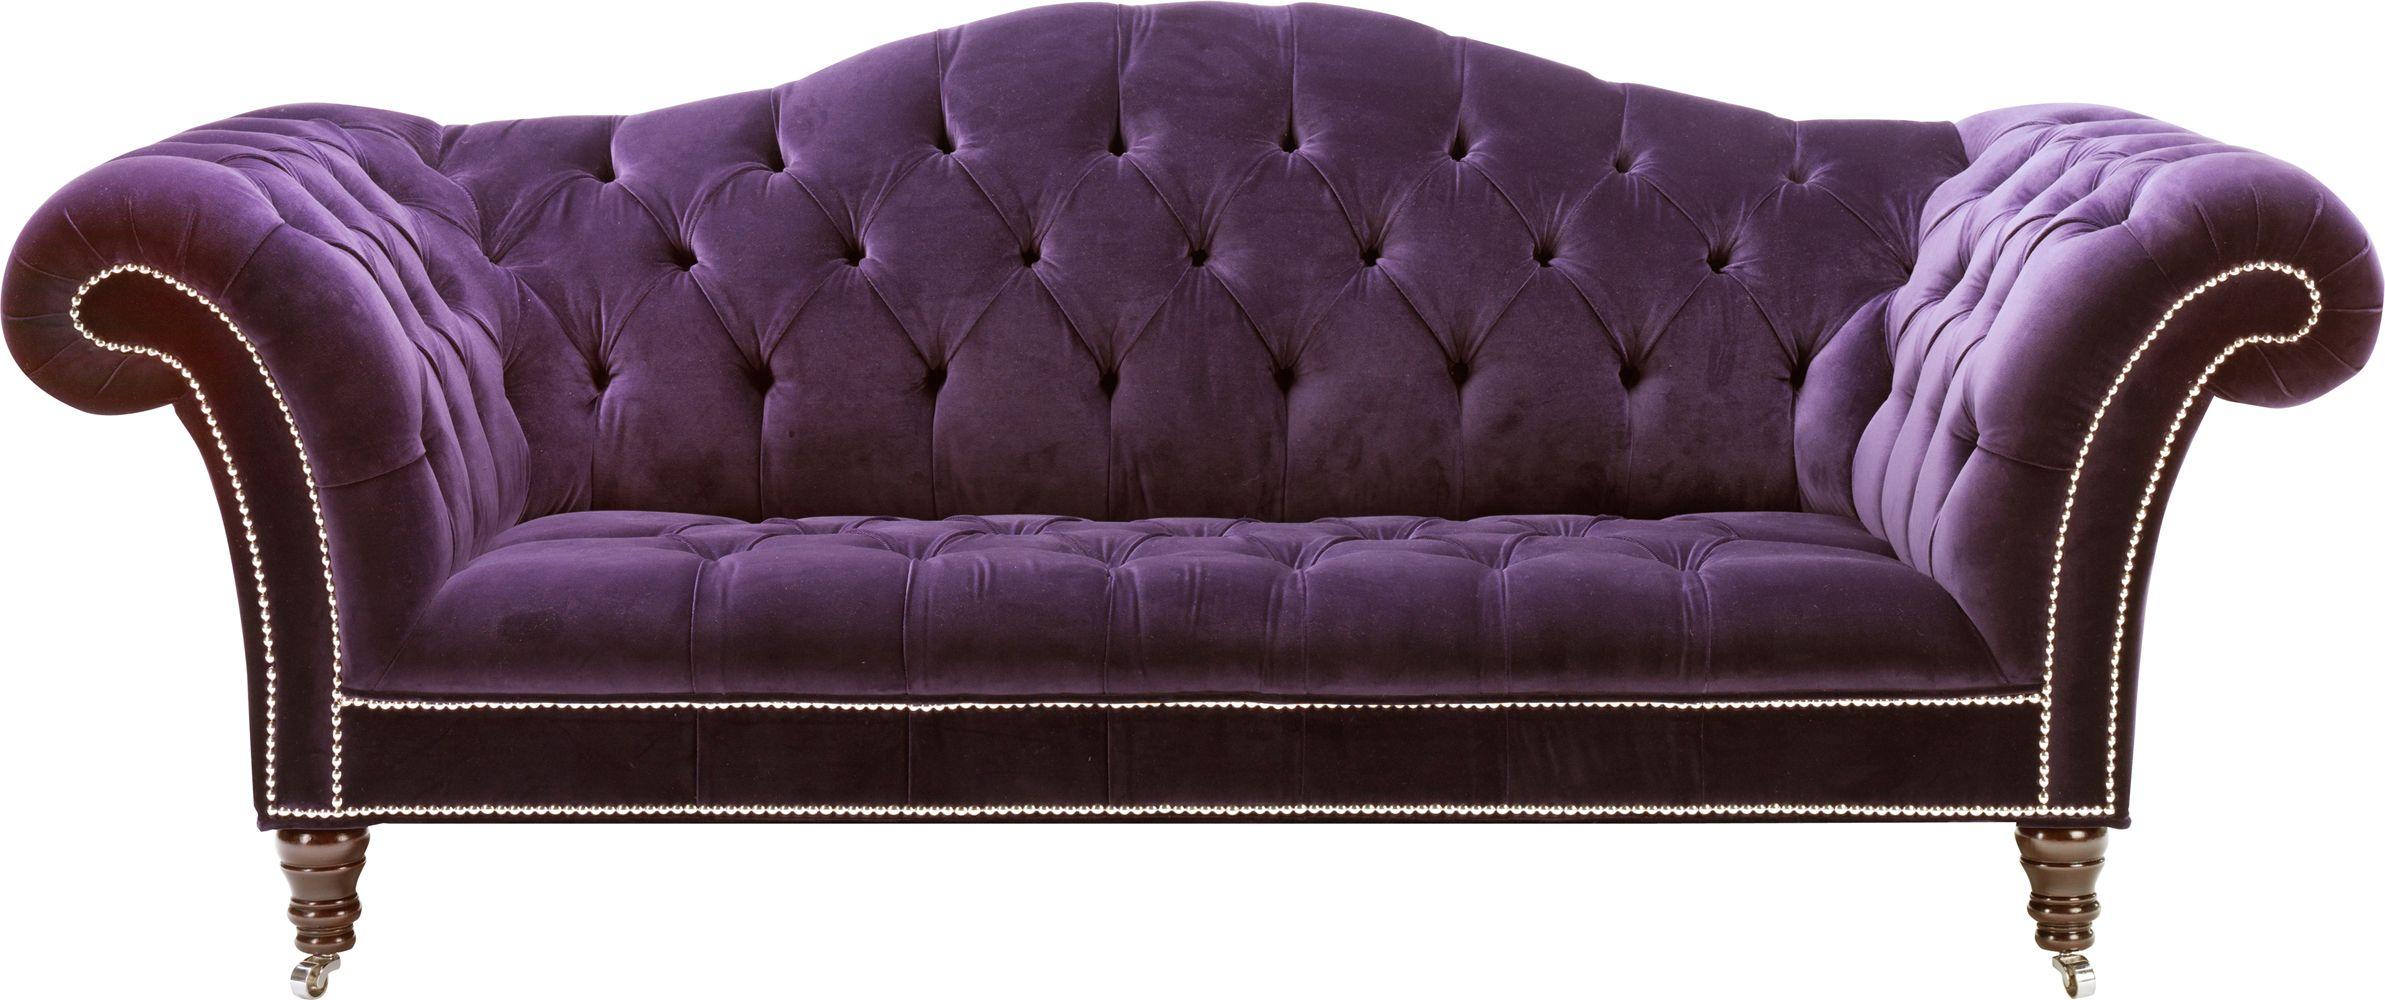 Full Size of The Grand Victorian Sofa From Design Is Stunning In This Rich Franz Fertig Englisches Ottomane Rolf Benz Elektrisch Garnitur 2 Teilig 2er Mit Abnehmbaren Bezug Sofa Sofa Lila